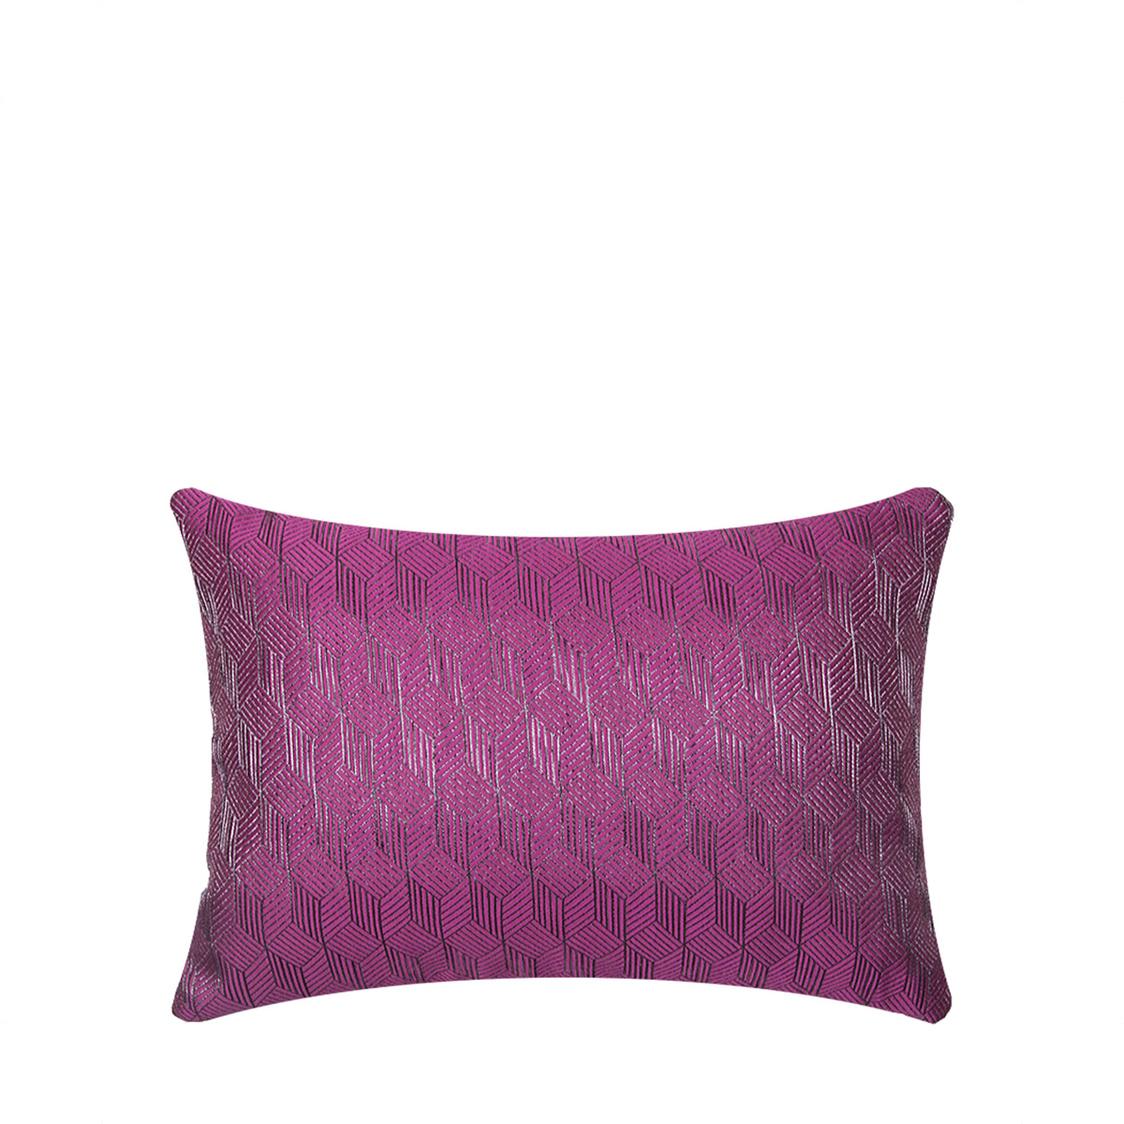 JRapee Anthunam Oblong Cushion Fuchsia 33x48cm